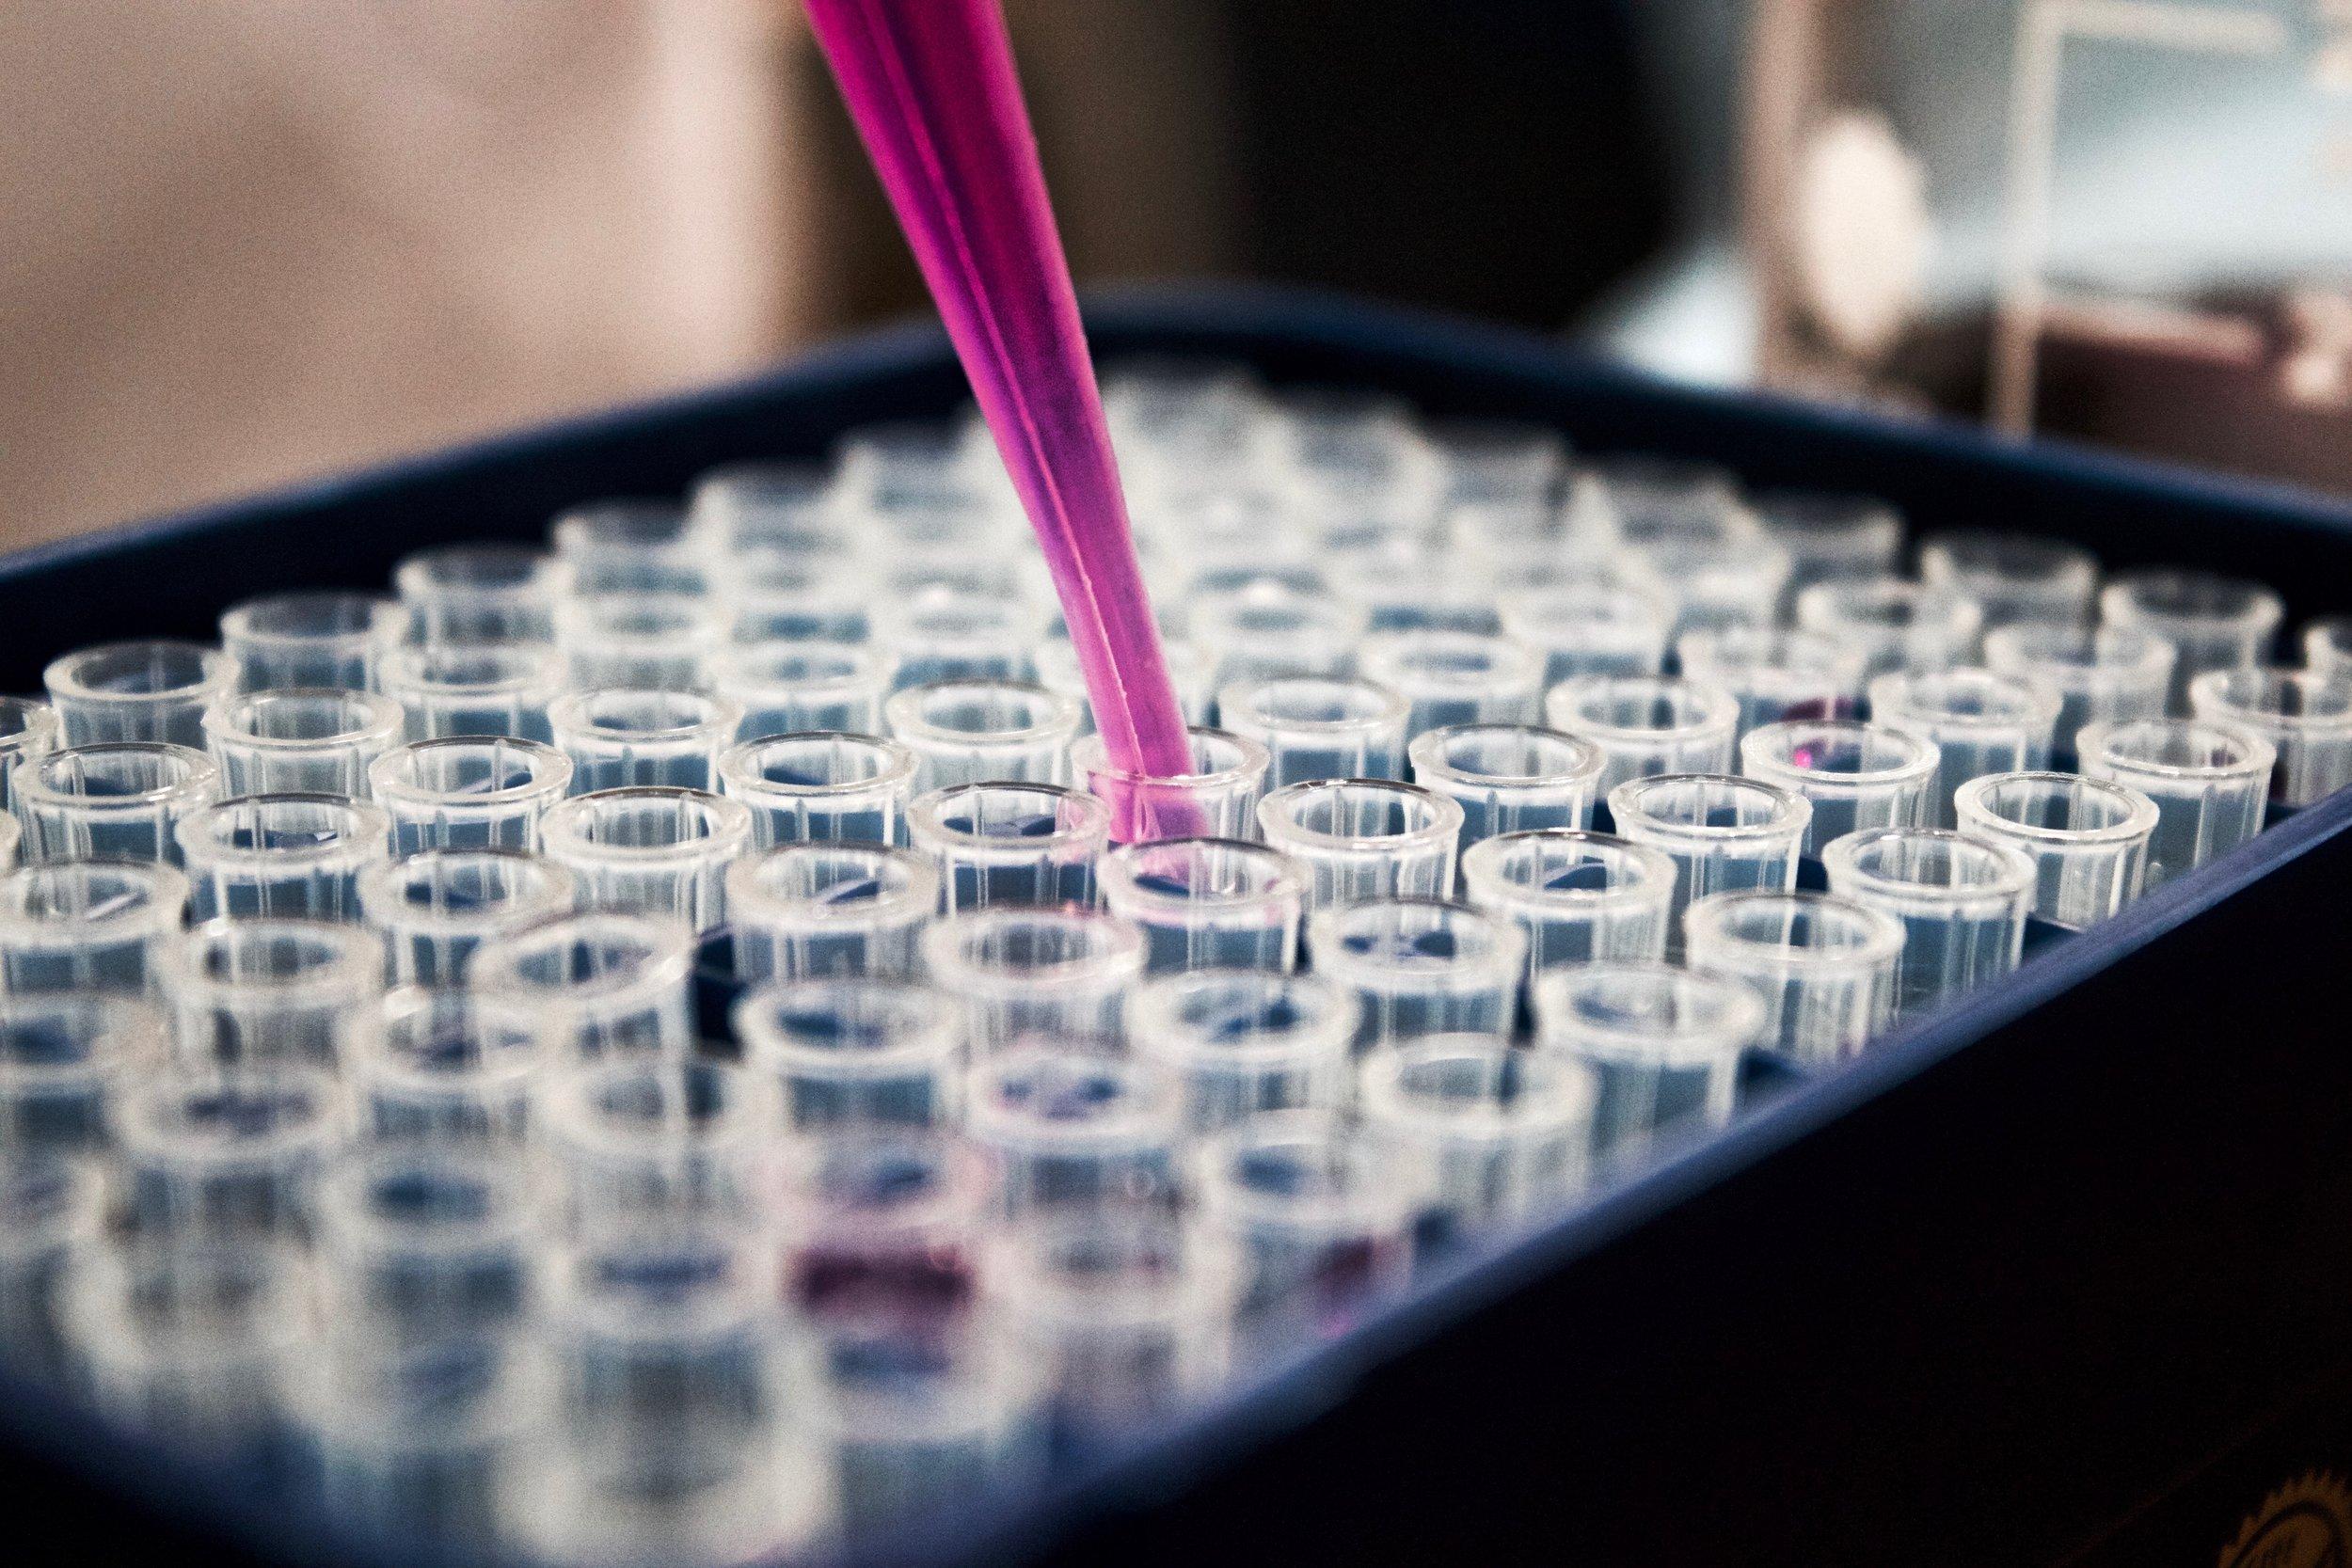 test tube pharmacogenetic tests dna